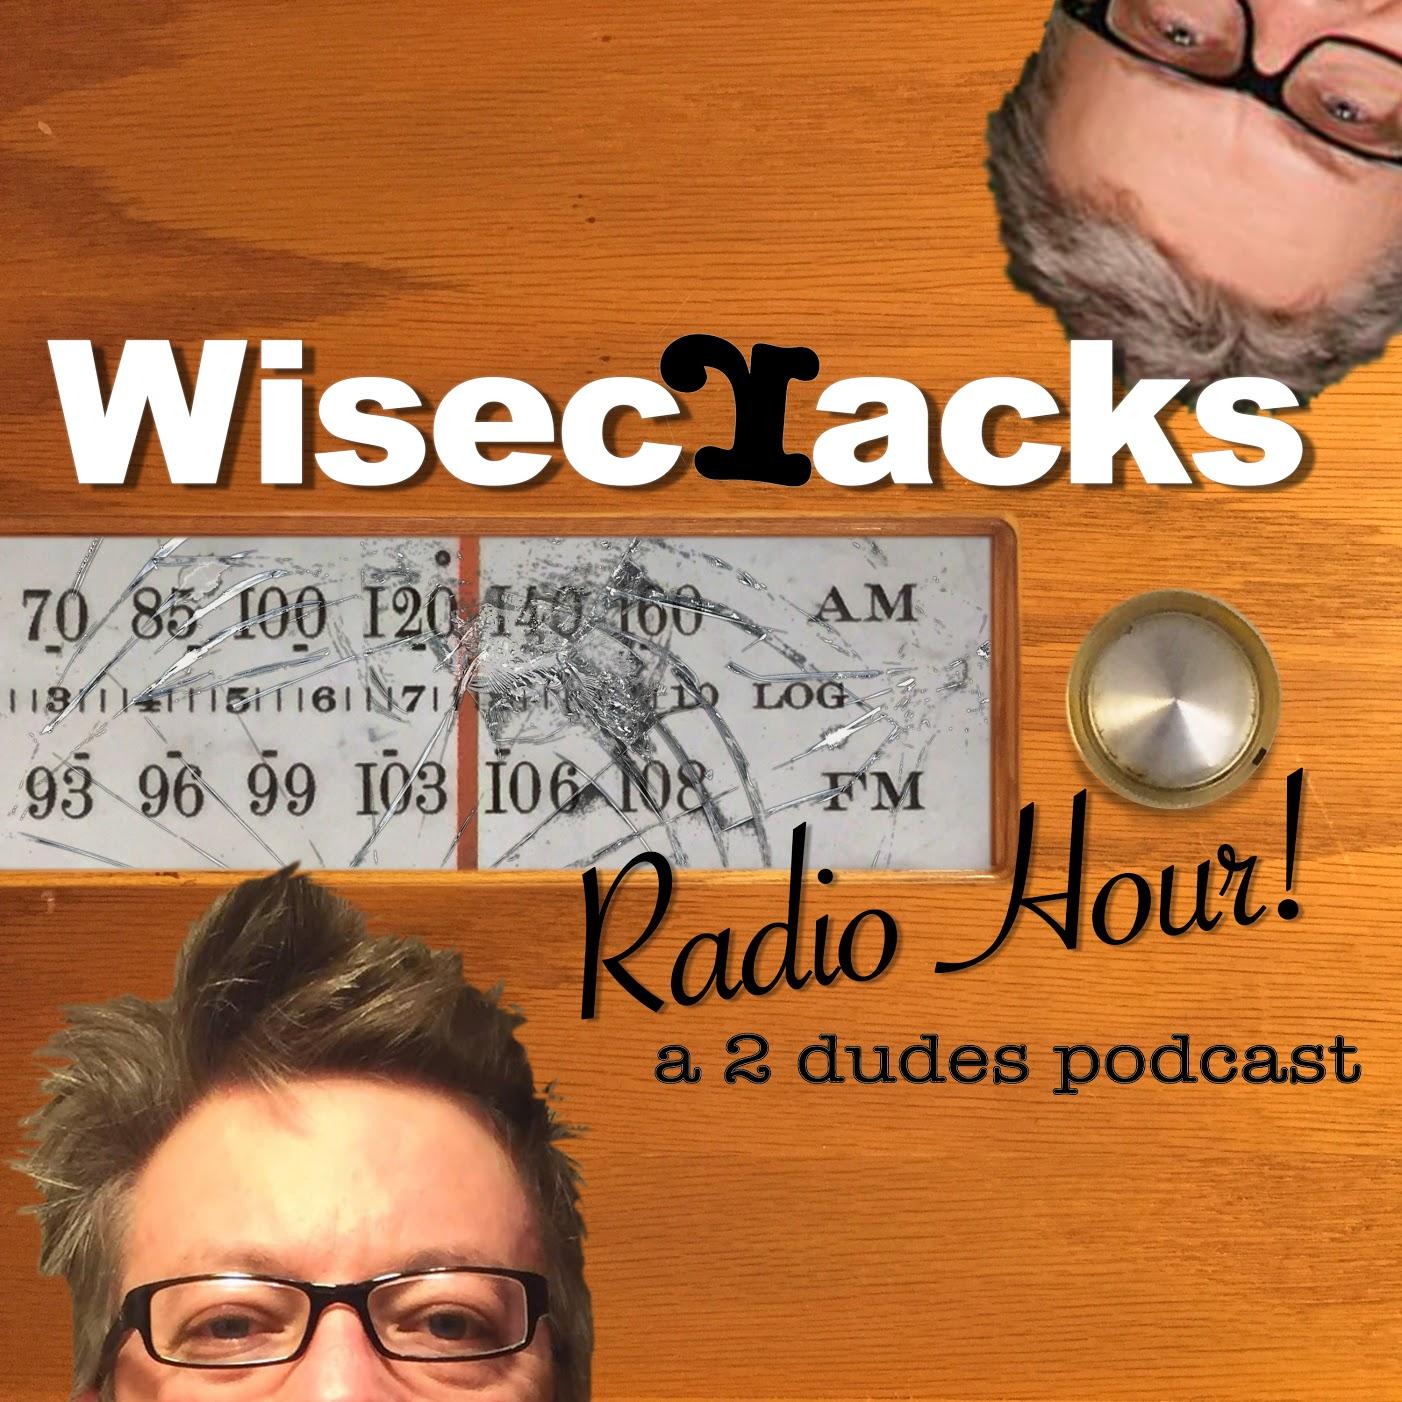 Wisecracks Radio Hour! show art